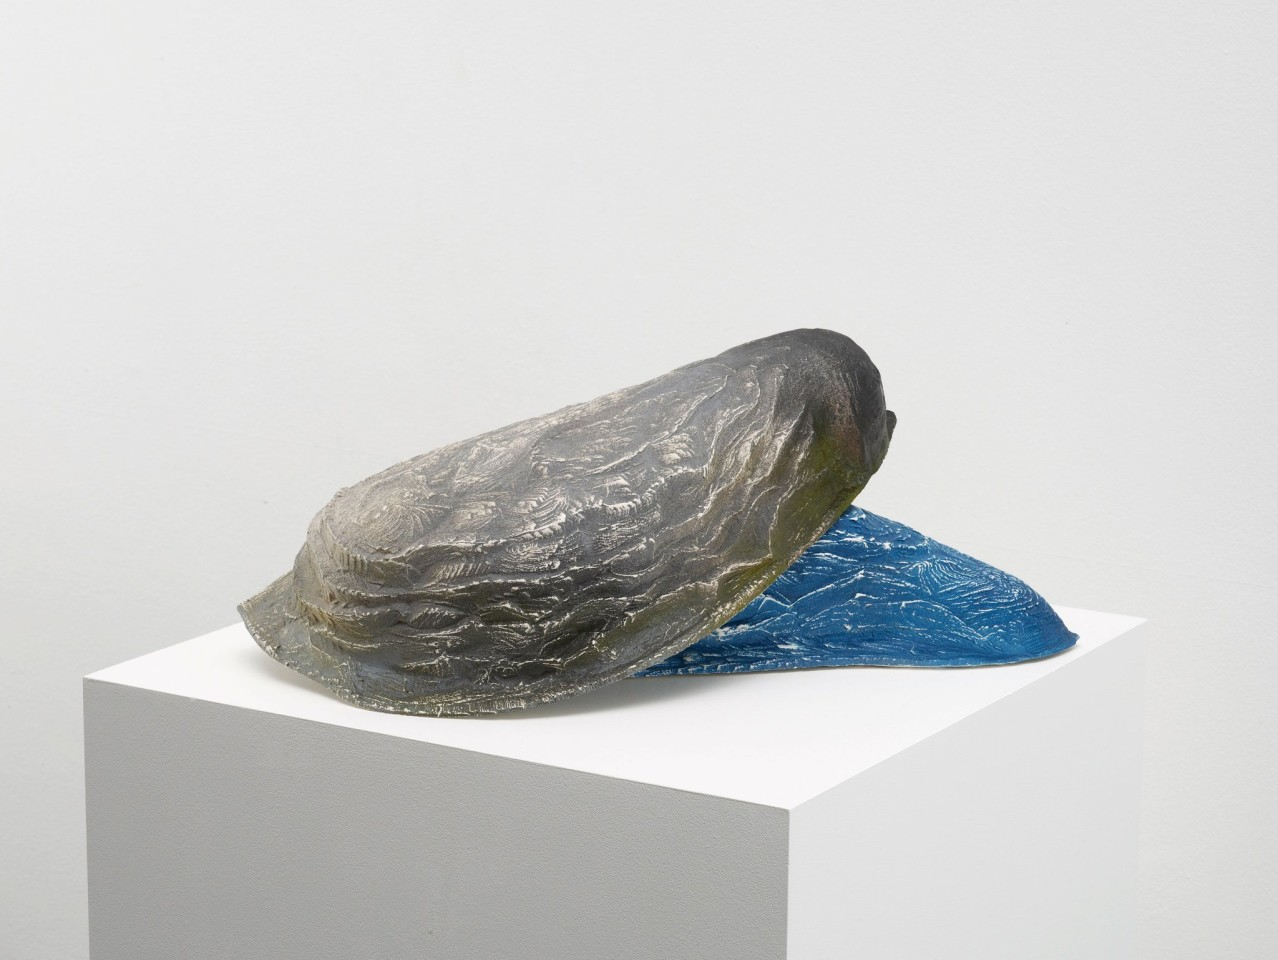 Jess Flood Paddock, London Oyster Shells, 2012